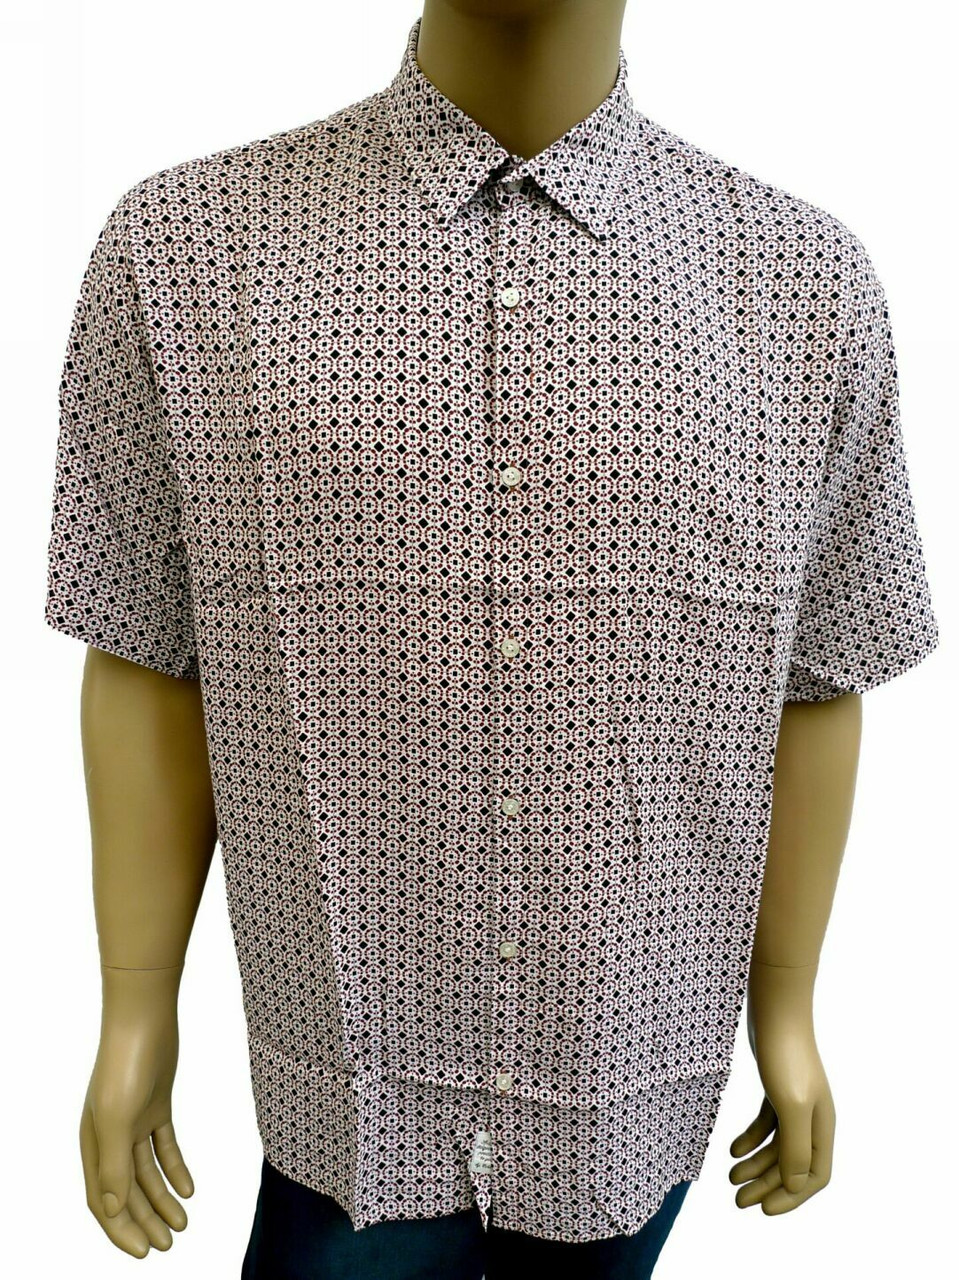 рубашка мужская хлопковая прямая